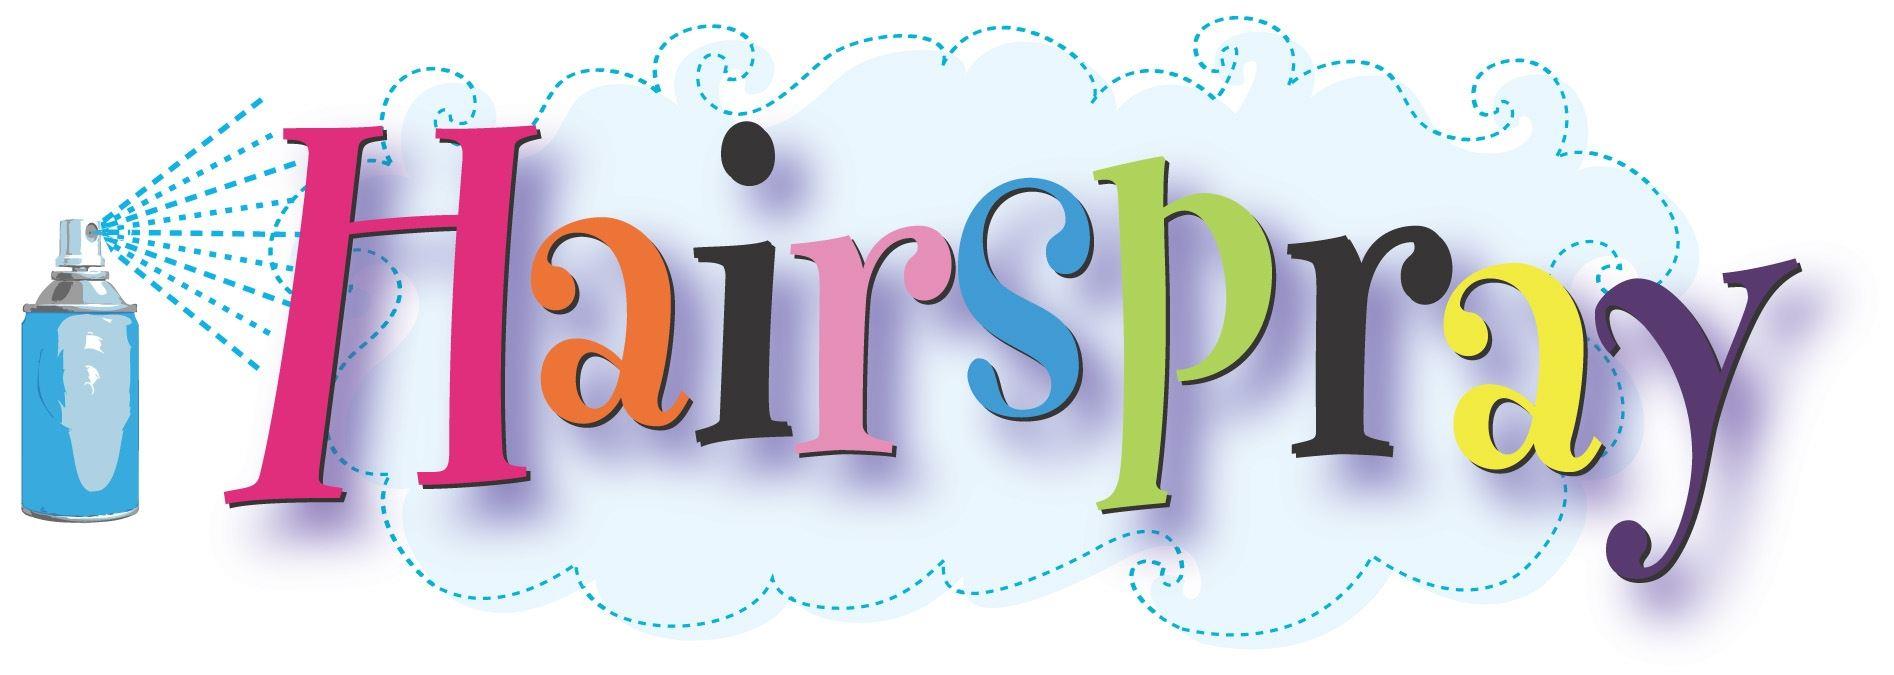 Hairspray logo